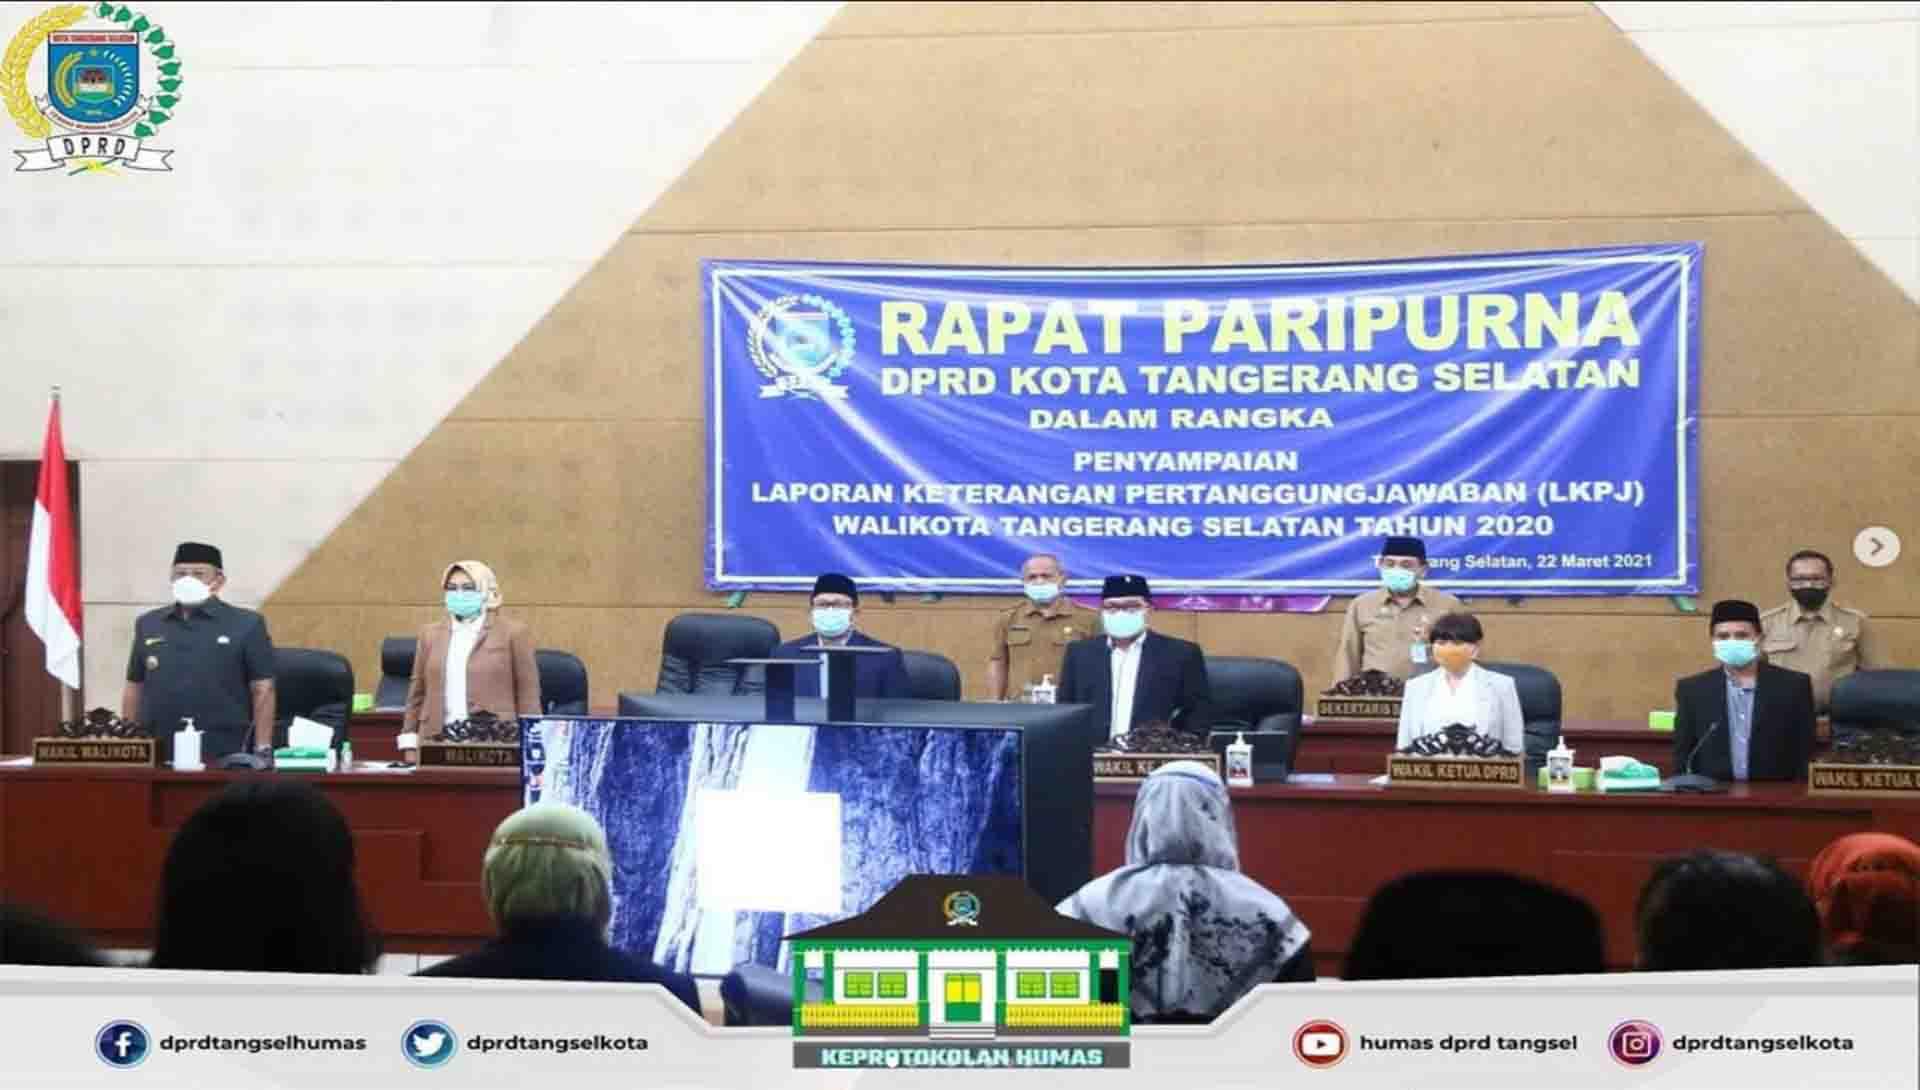 Rapat Paripurna Agenda LKPJ Walikota Tangerang Selatan Tahun 2020